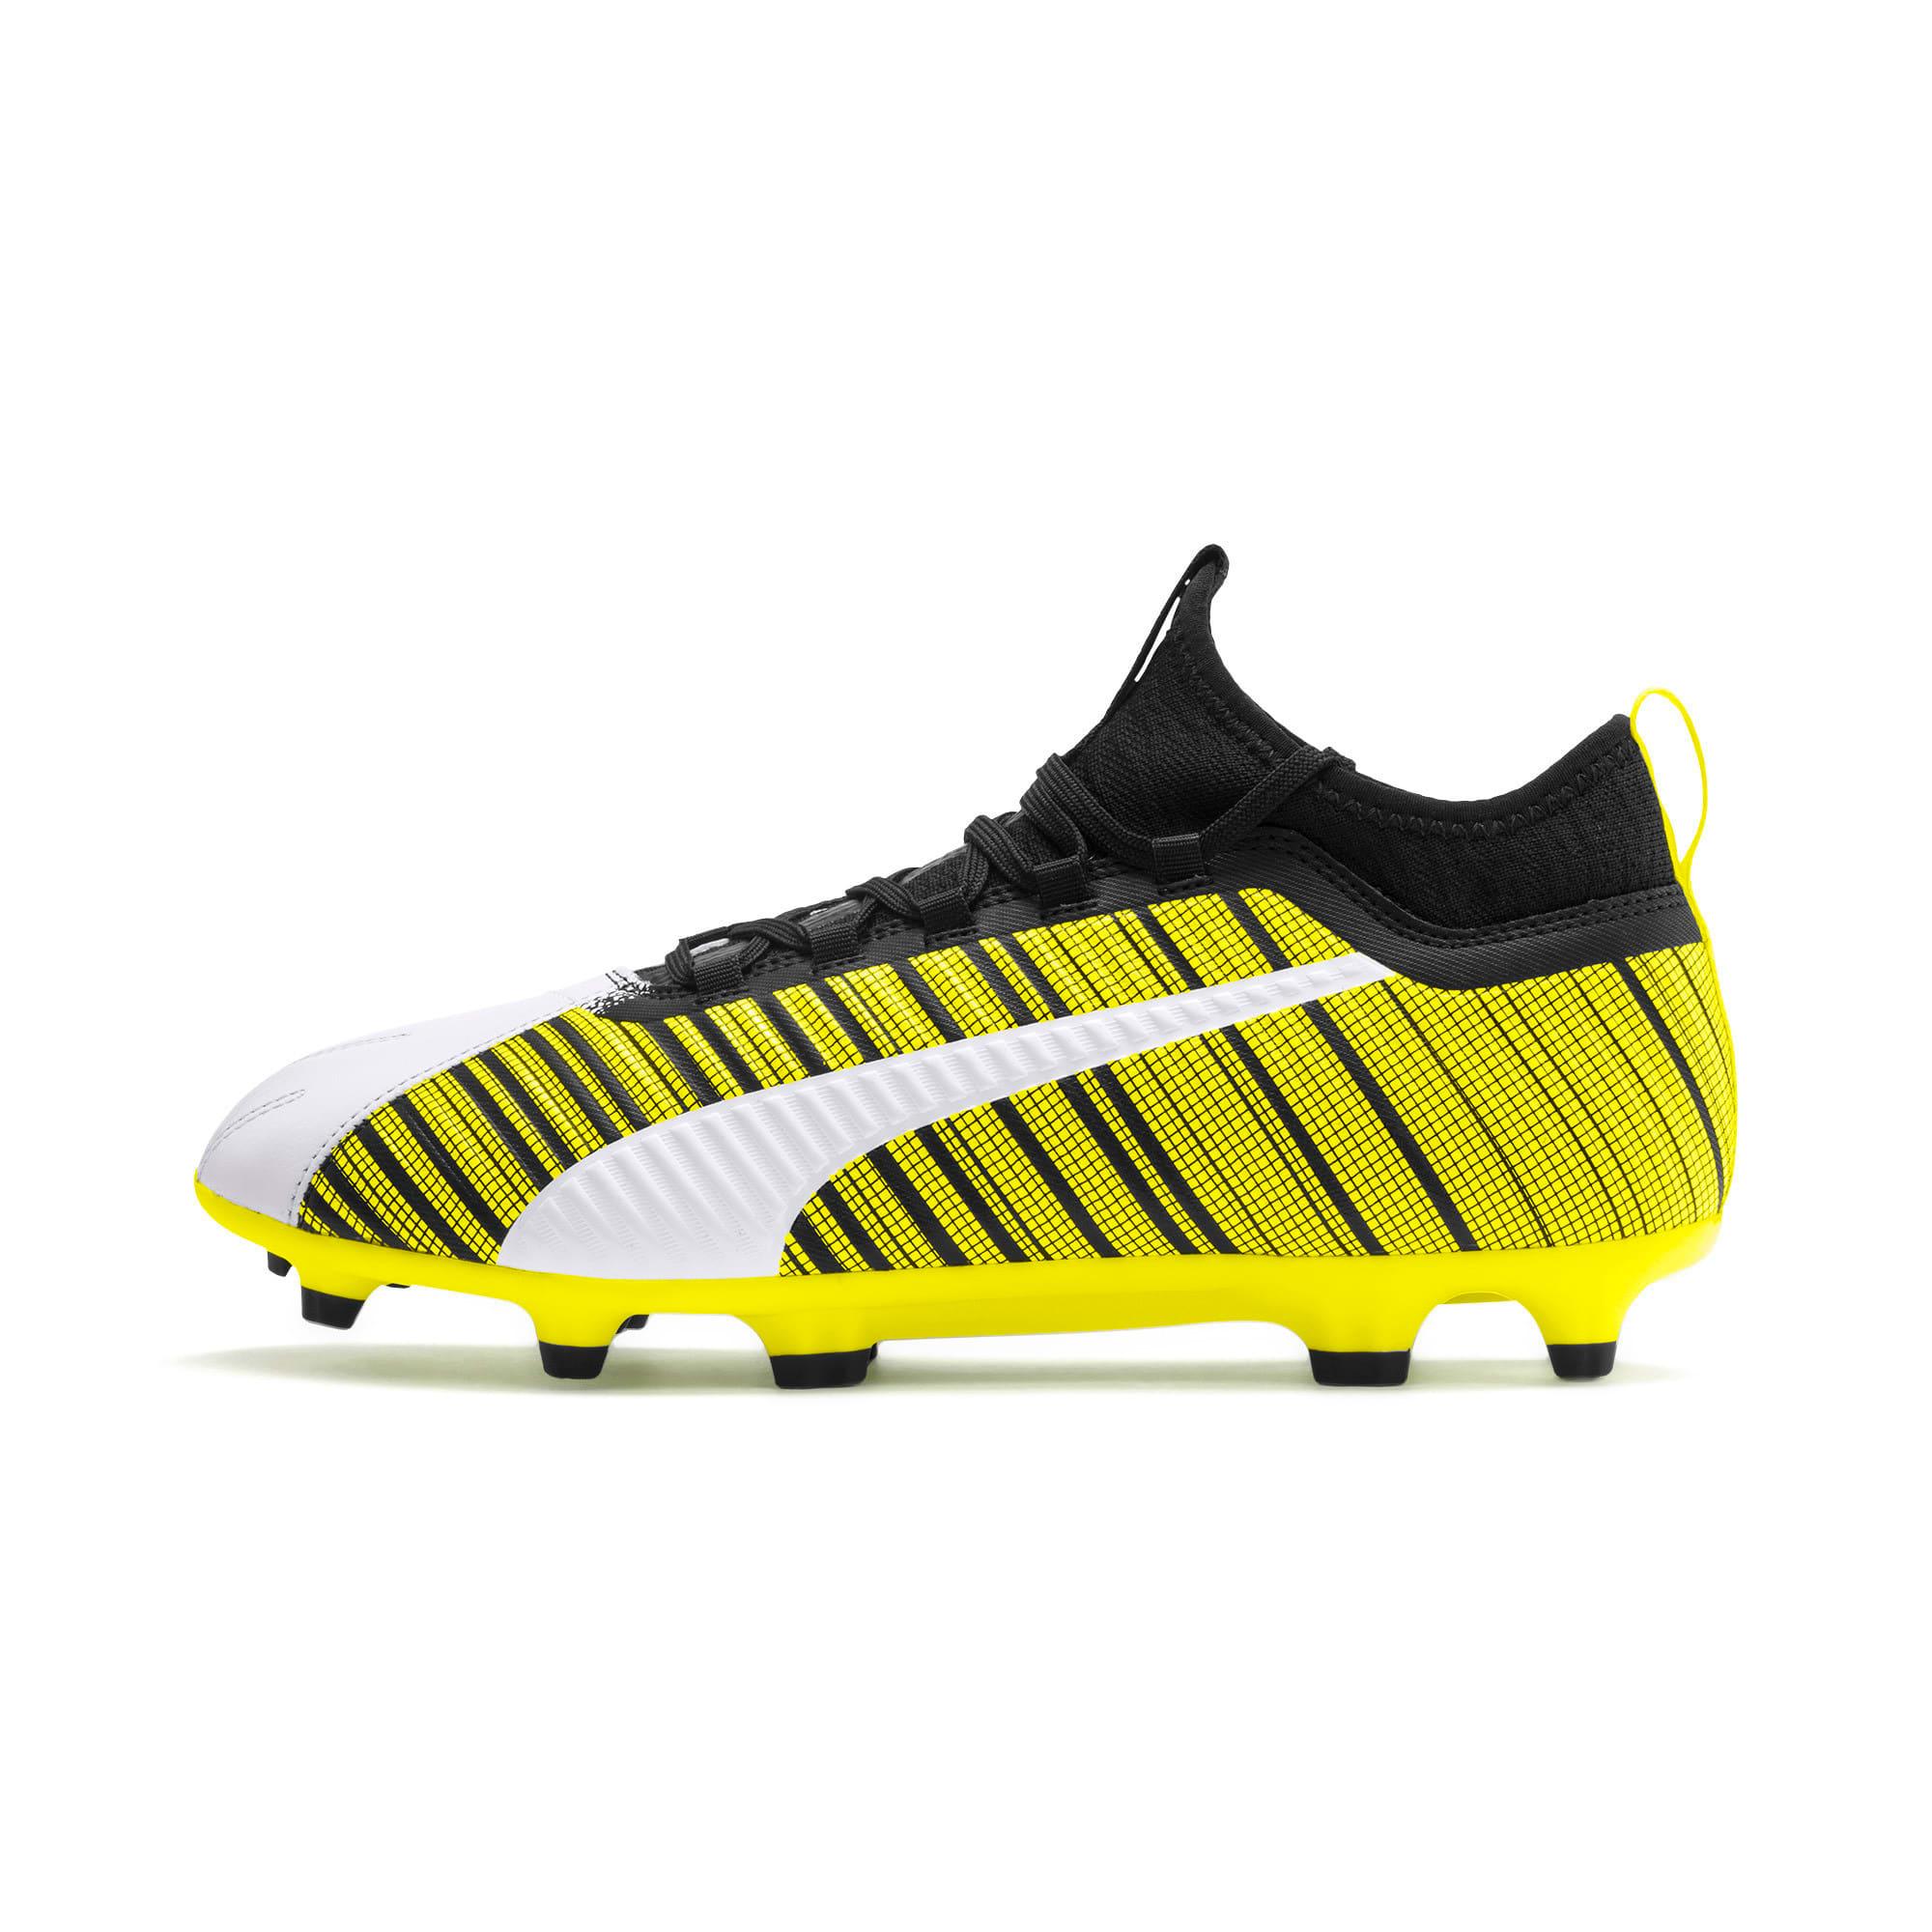 Thumbnail 1 of PUMA ONE 5.3 FG/AG Men's Soccer Cleats, White-Black-Yellow Alert, medium